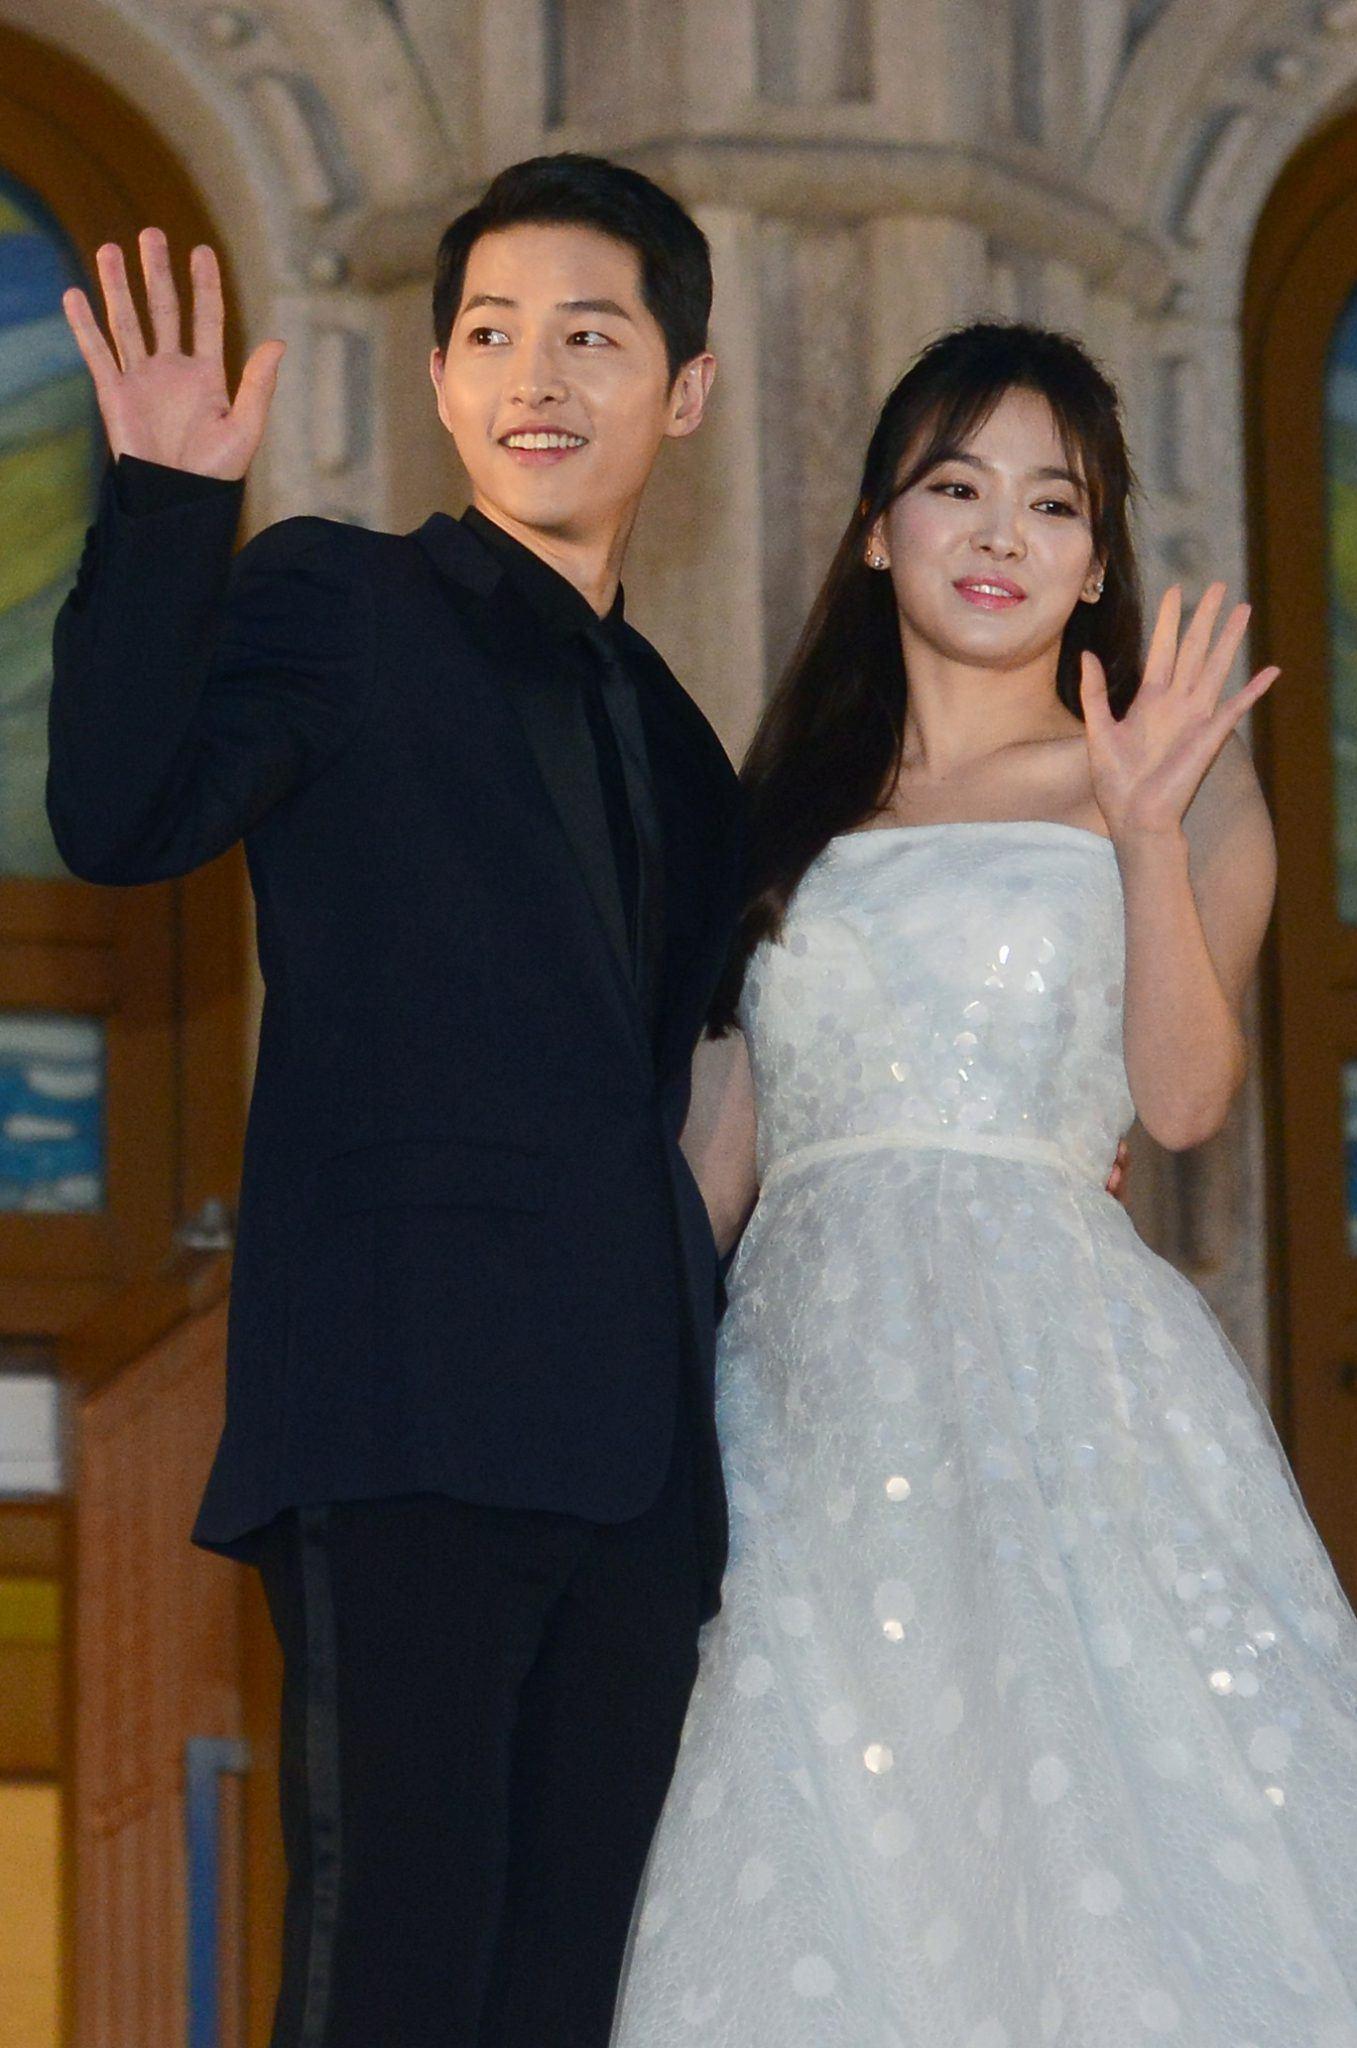 TRENDING] Song Joong Ki And Song Hye Kyo Hold Secret ...